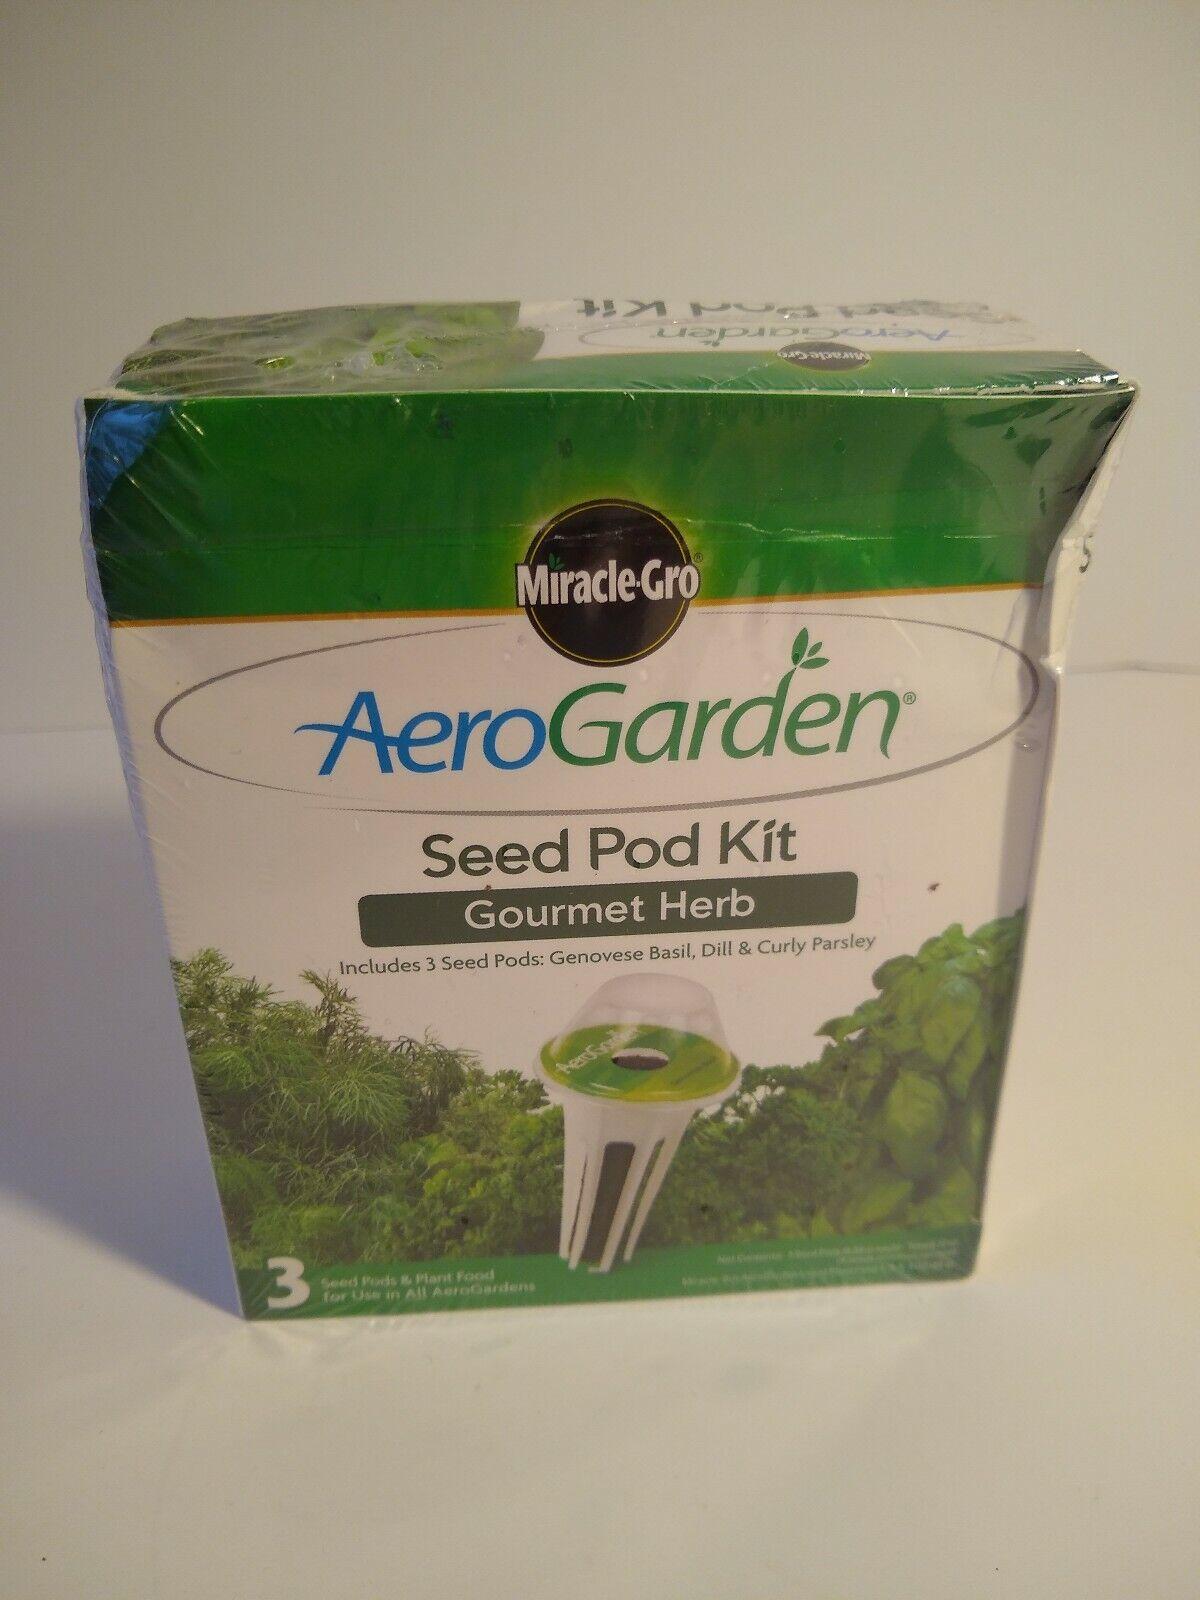 NEW Miracle-Gro Aero Garden Indoor Gardening Seed Pod Kit, Gourmet Herbs 1